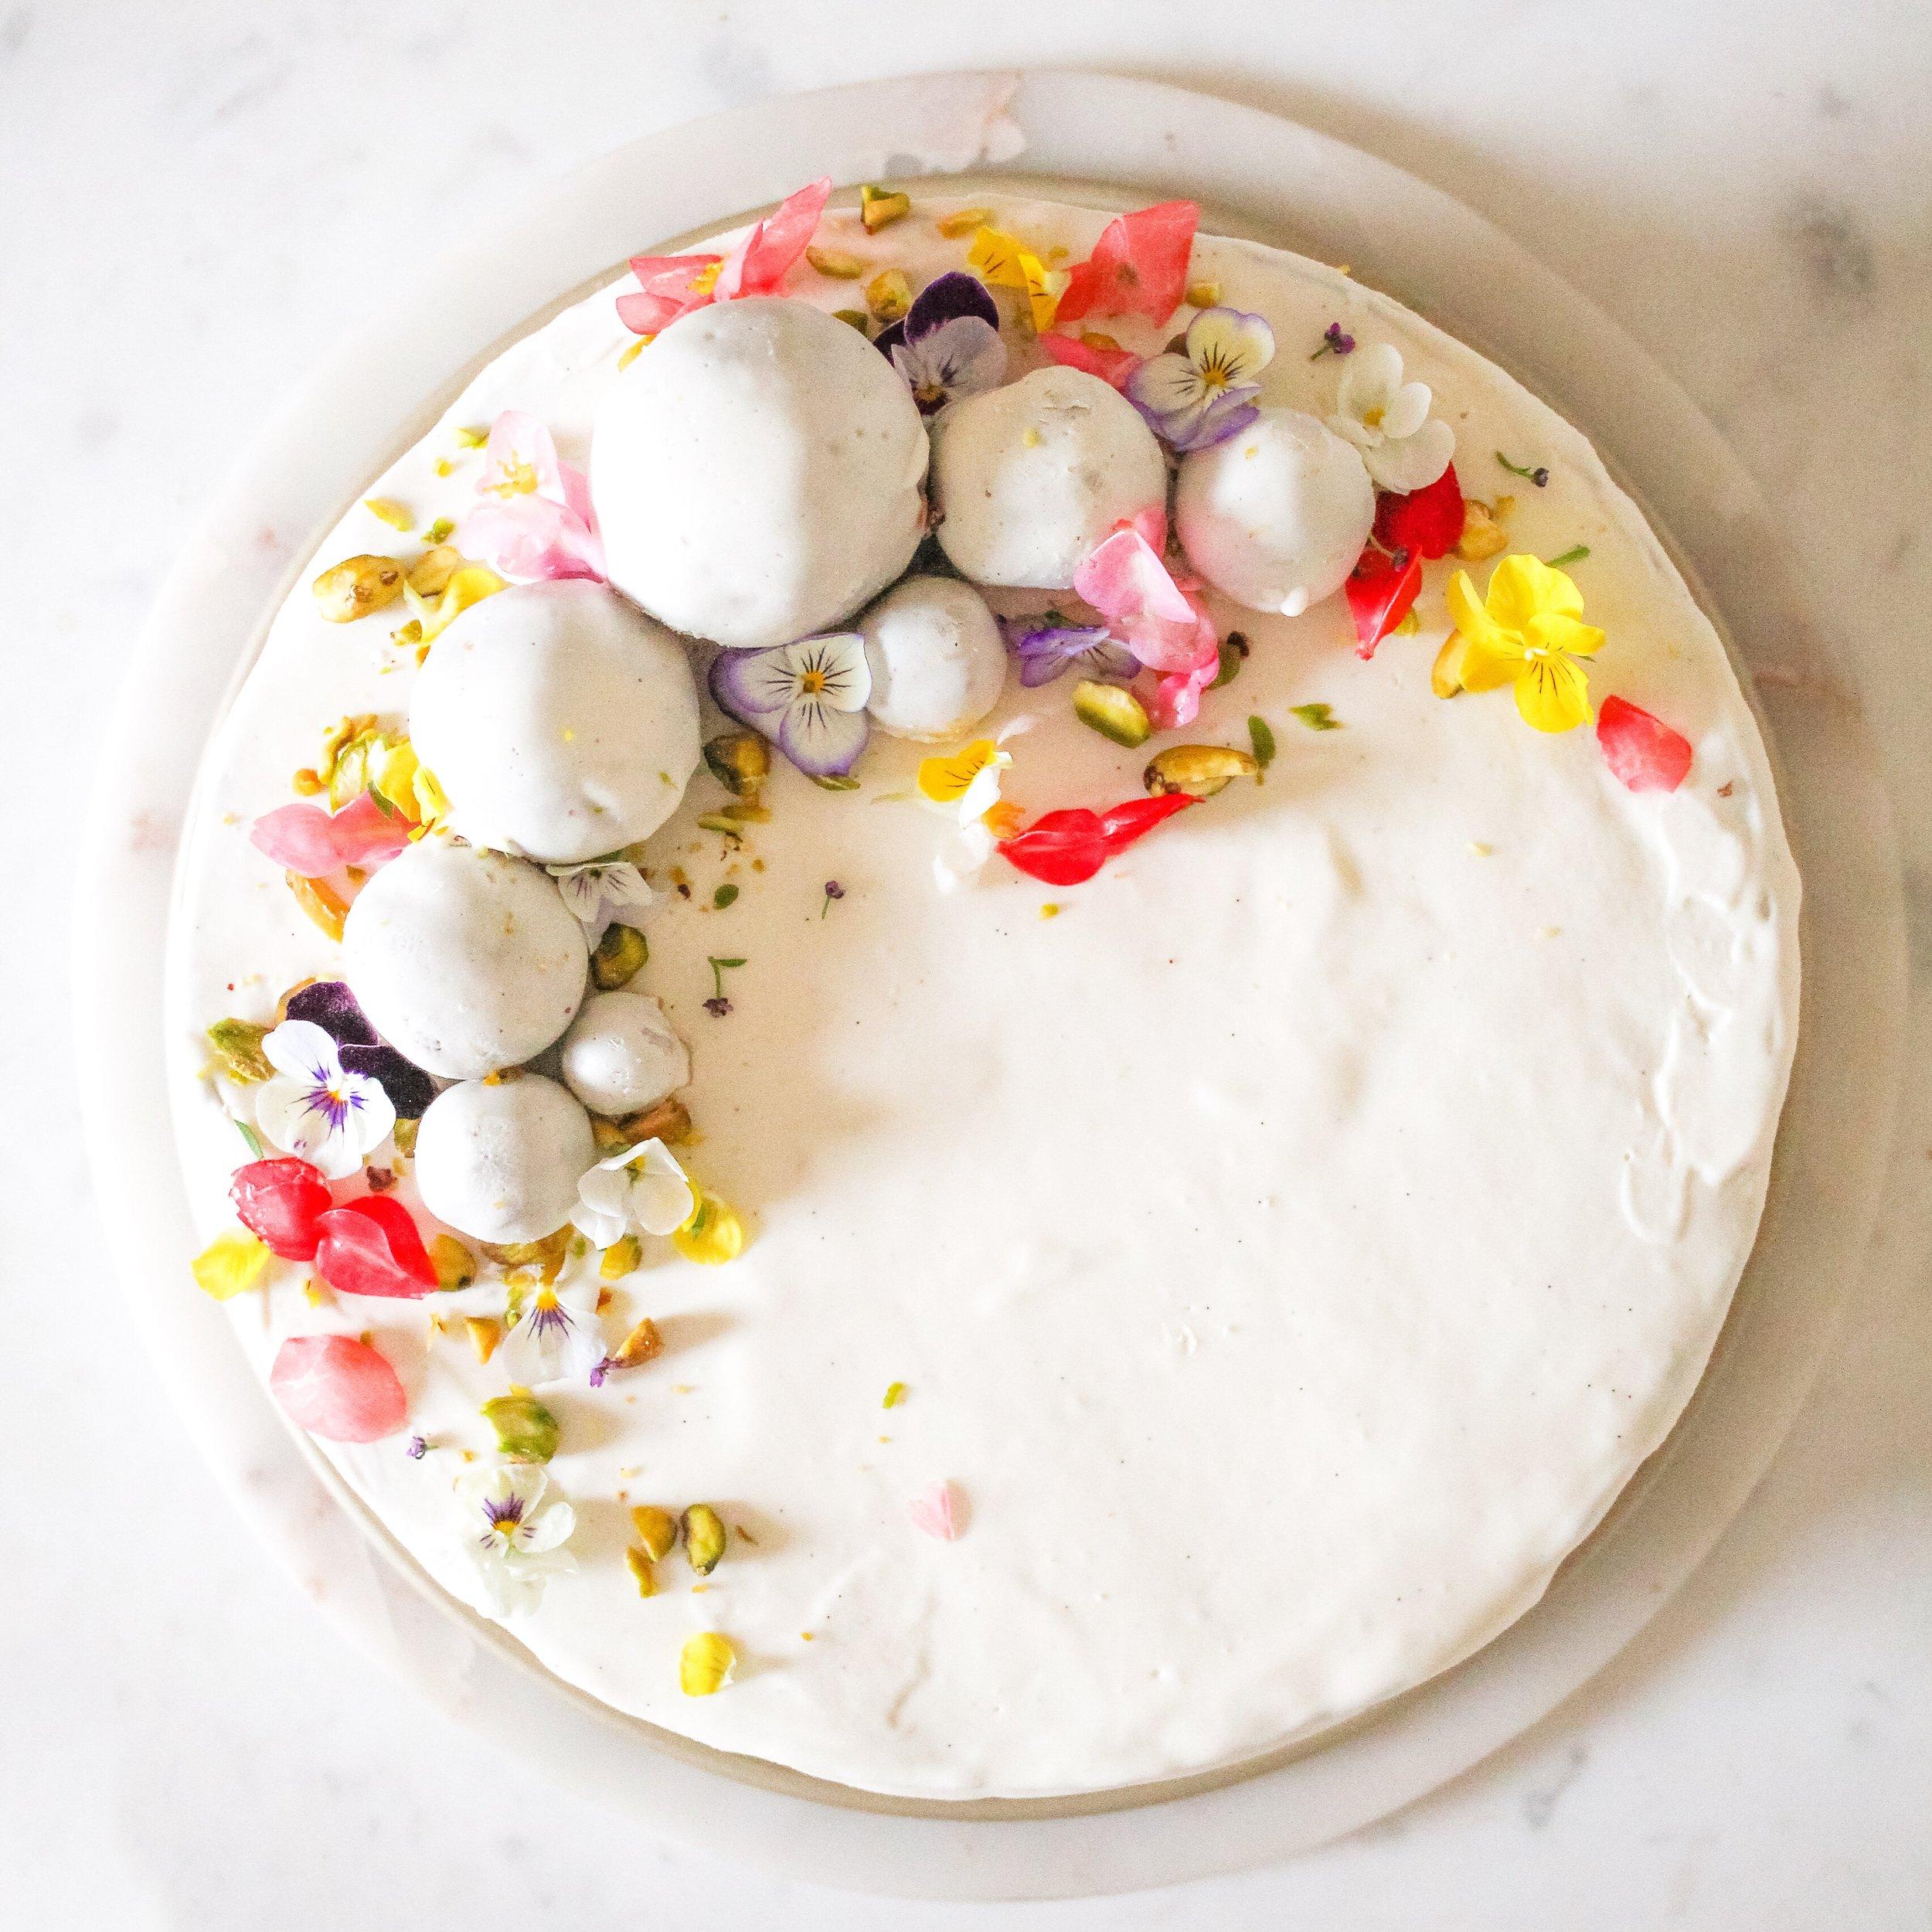 Pistachio Ice Cream Cake. Crumbly chocolate crust. Pistachio young coconut cream. Coconut butter glaze.